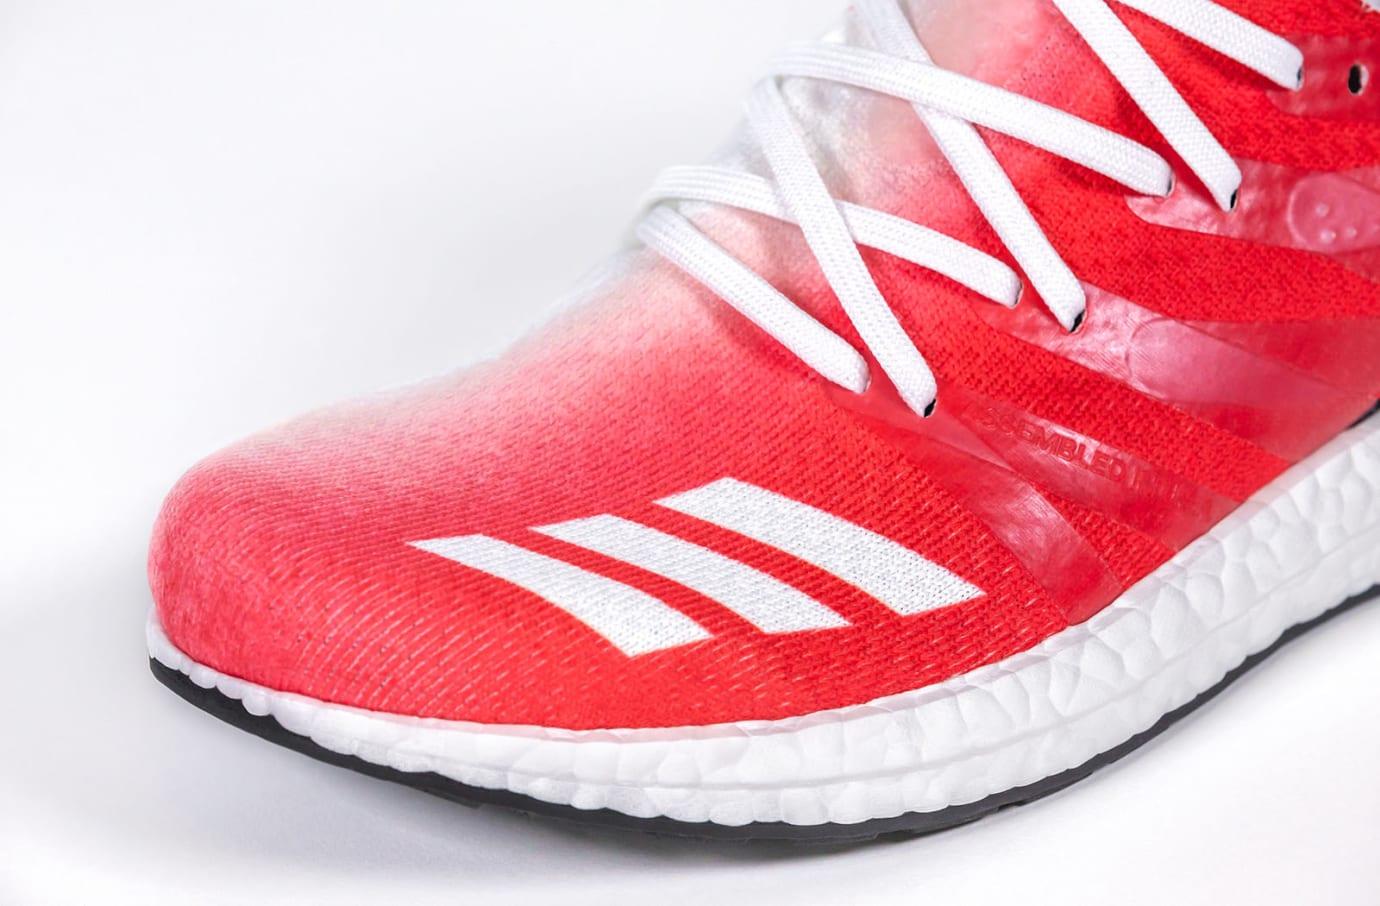 Adidas Speedfactory AM4BSBL 3